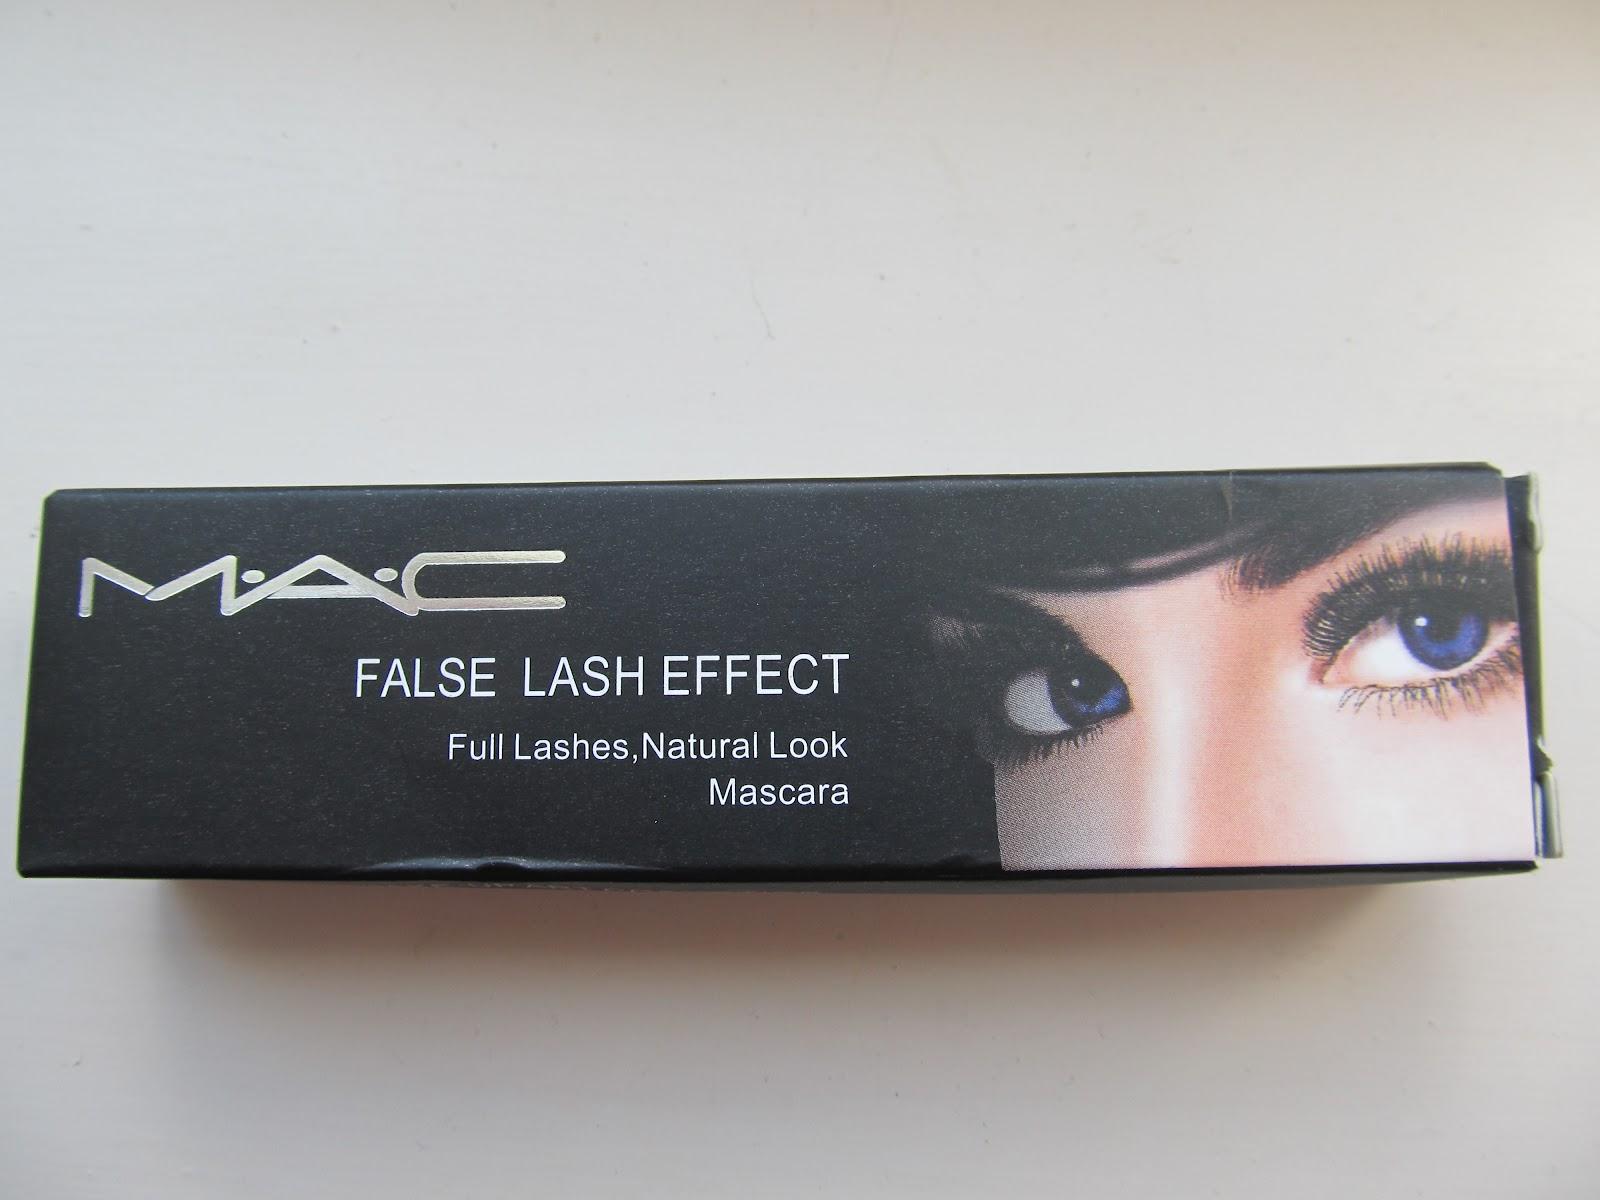 3398af1b985 bee mama | beauty, parenting & lifestyle blog: (fake) MAC False Lash ...